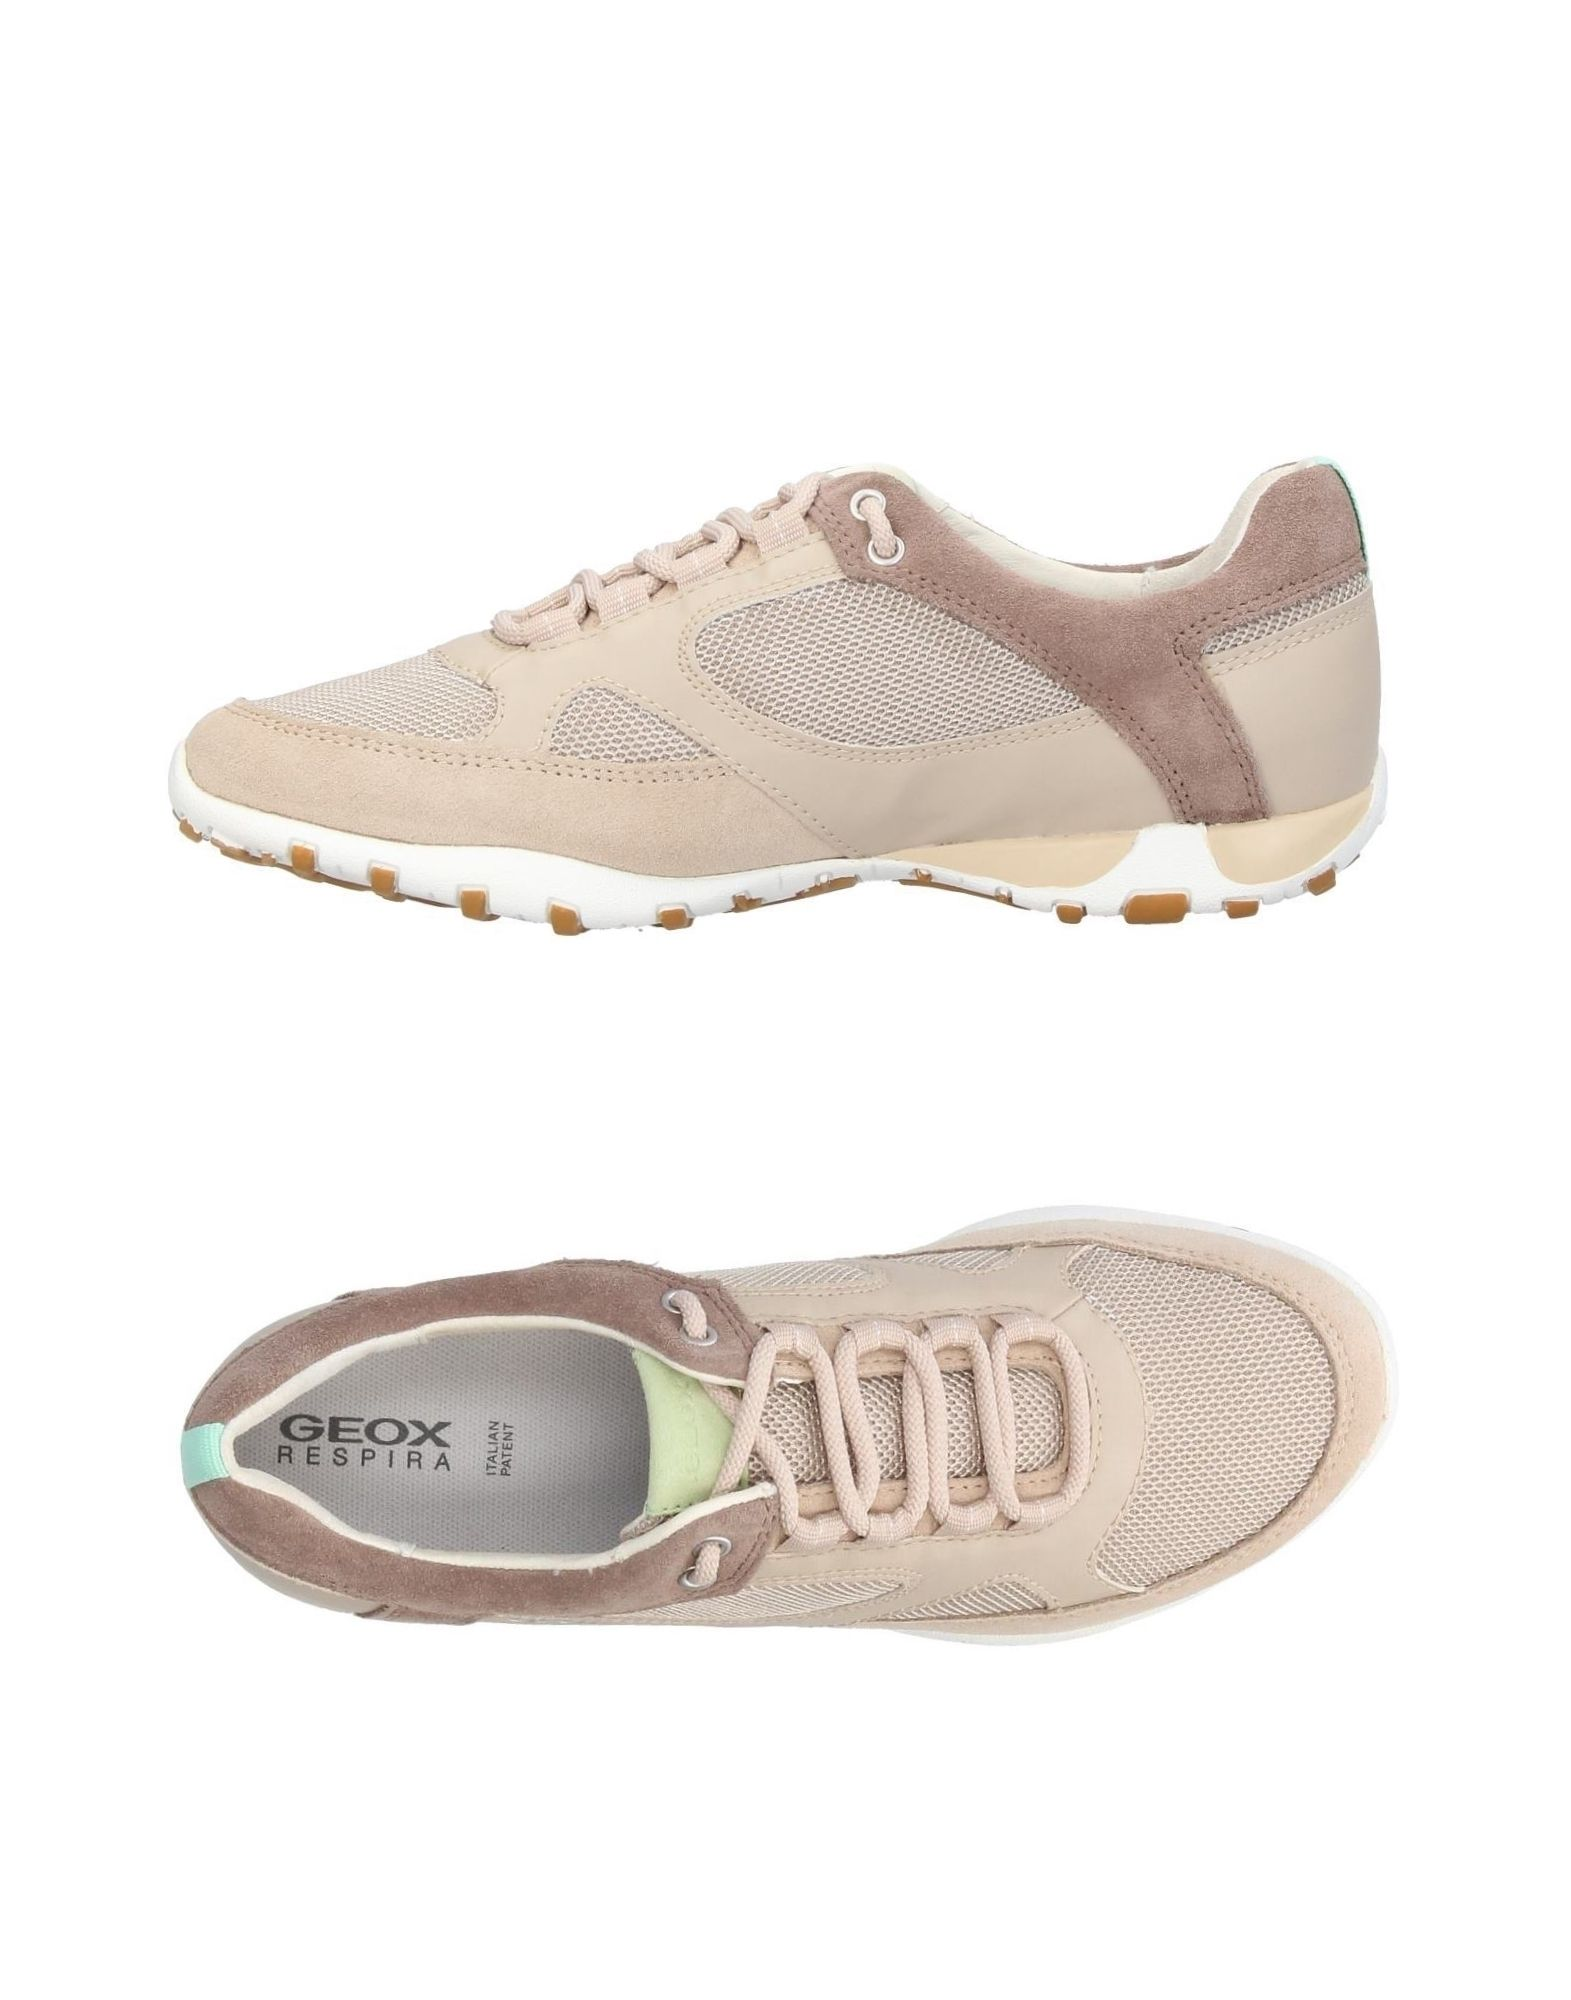 Moda Sneakers Geox Donna 11414170CC - 11414170CC Donna 165c21